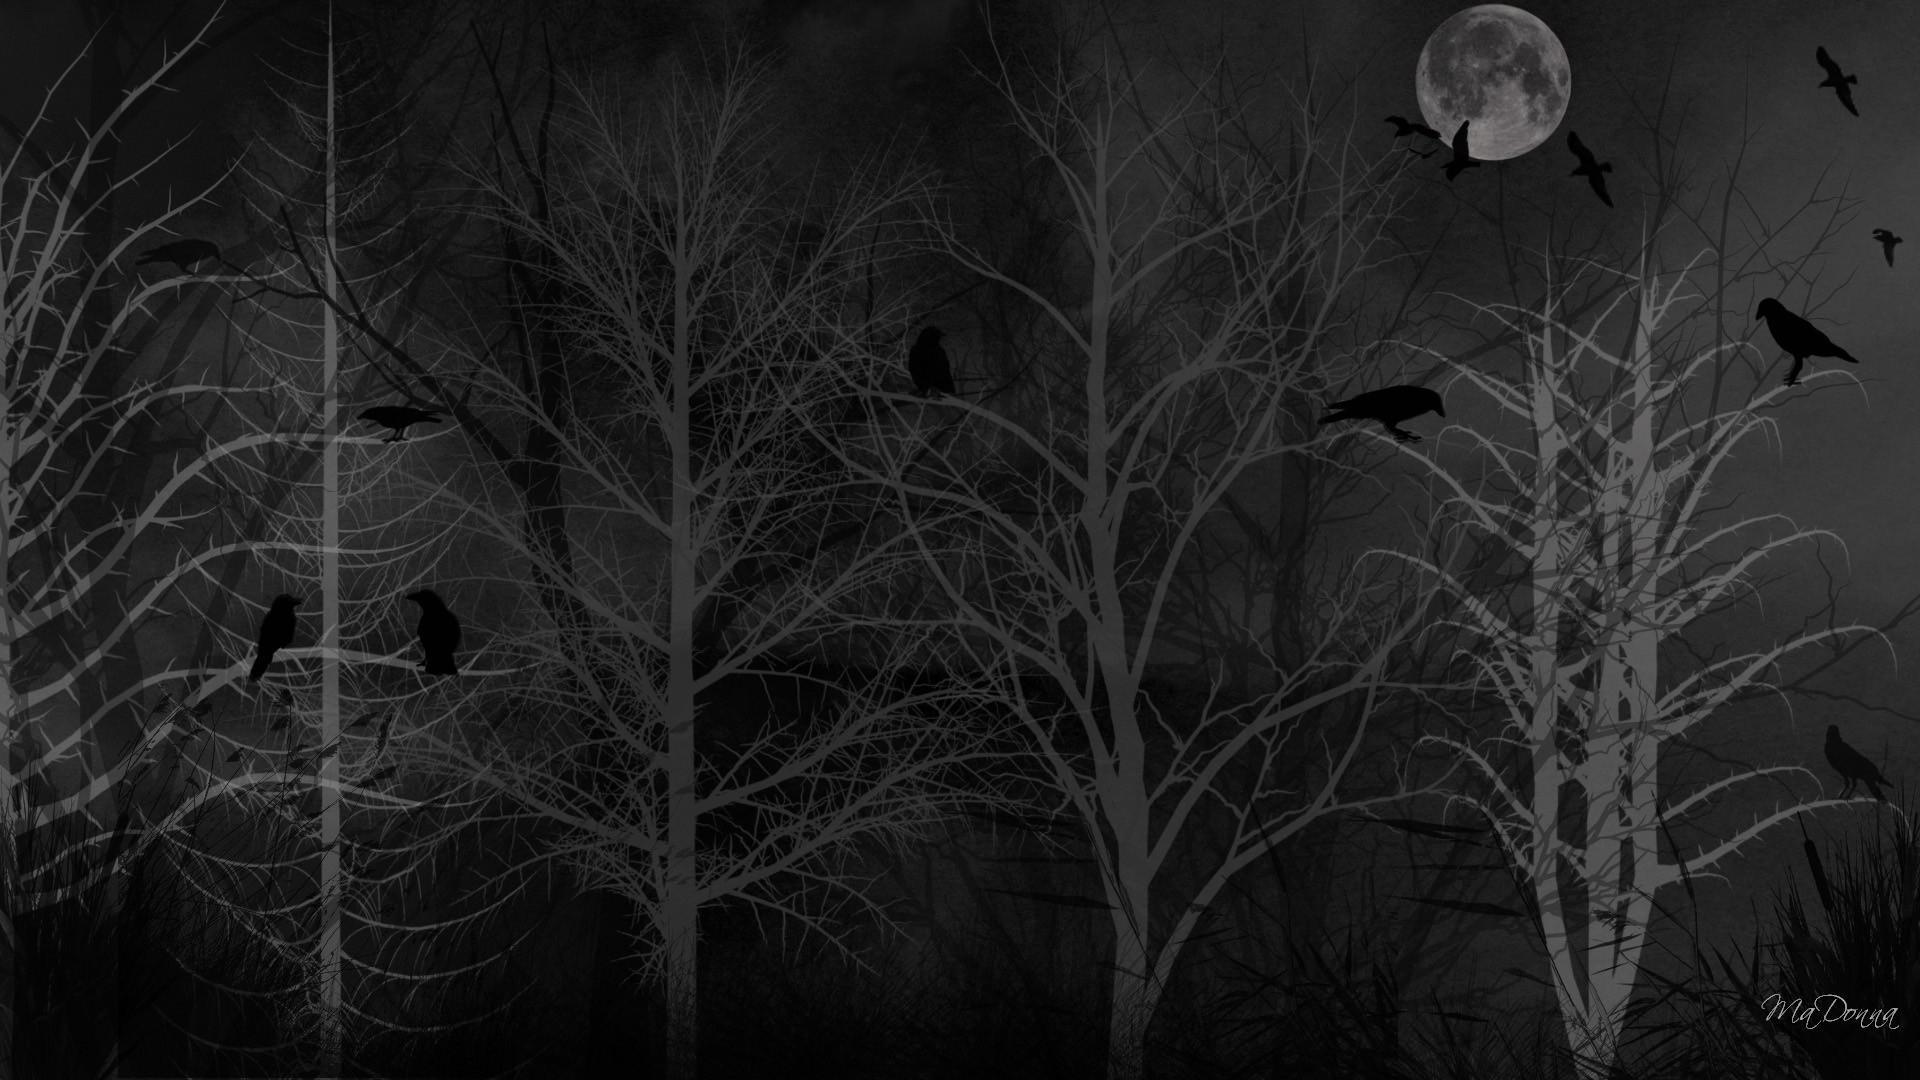 Spooky Tag – Dreads Winter Firefox Persona Birds Halloween Dark Forest  Spooky Moon Crows Black Wallpaper